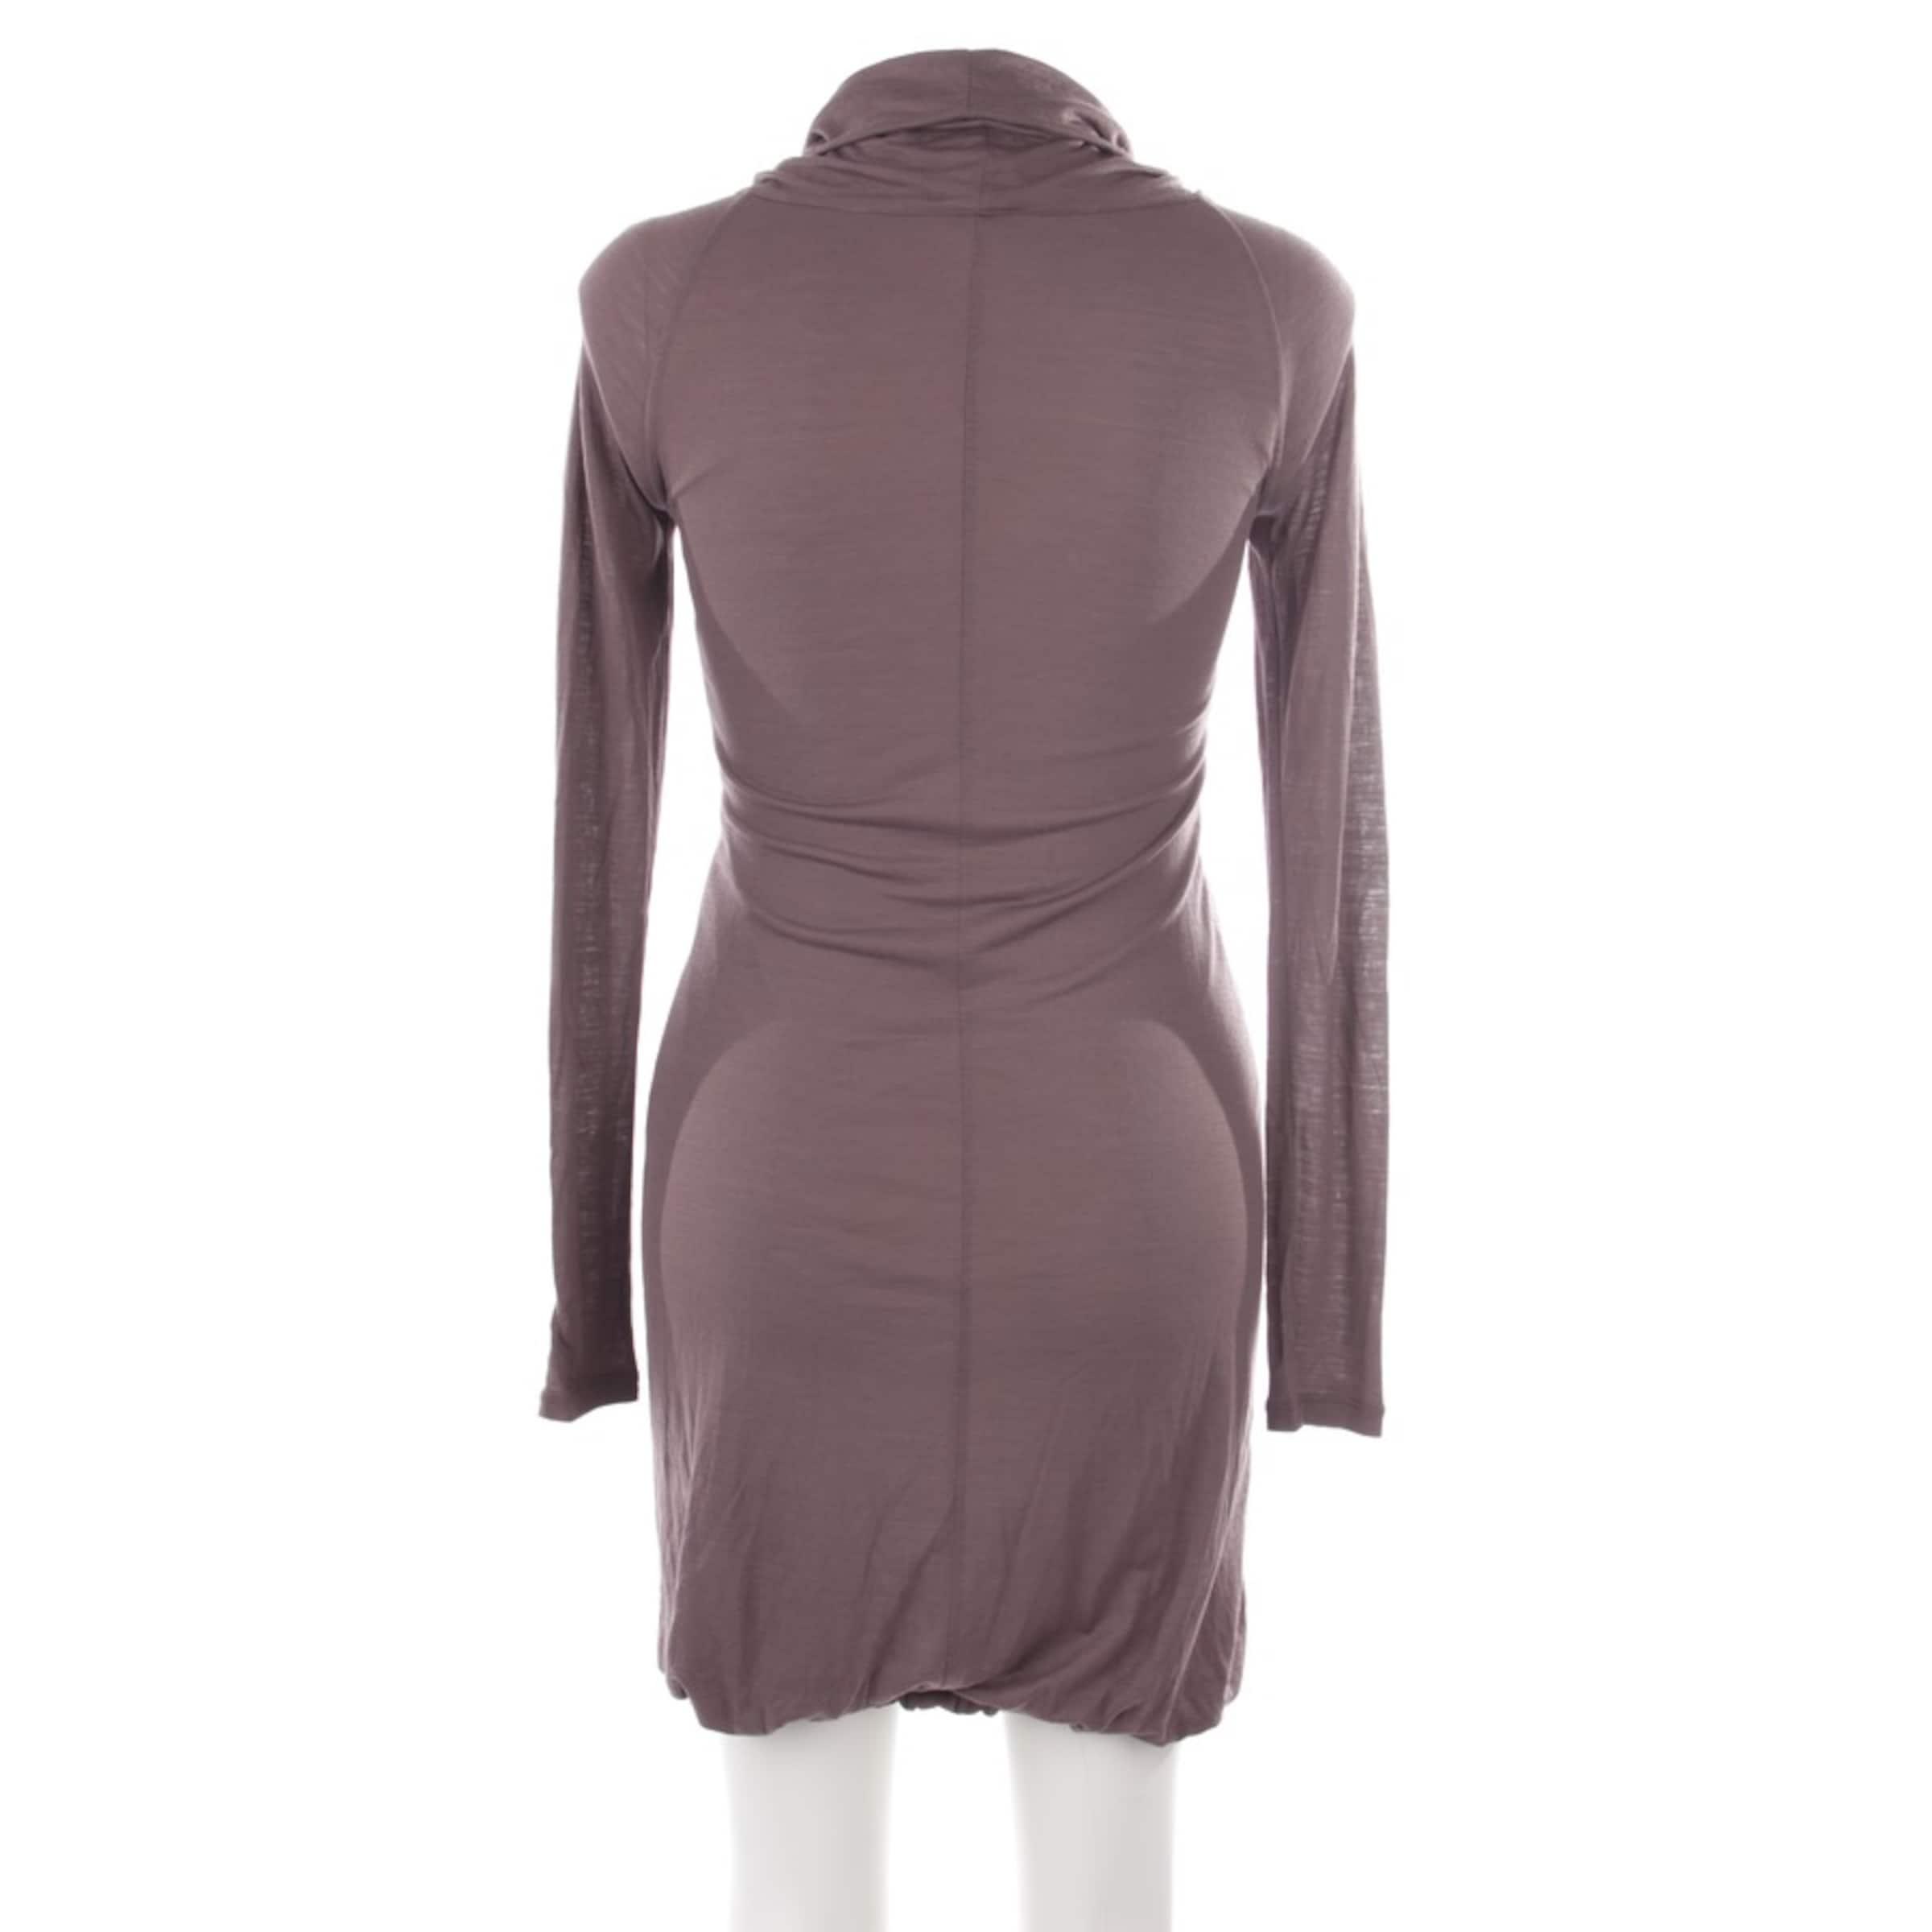 PATRIZIA PEPE Kleid in 32 in taupe